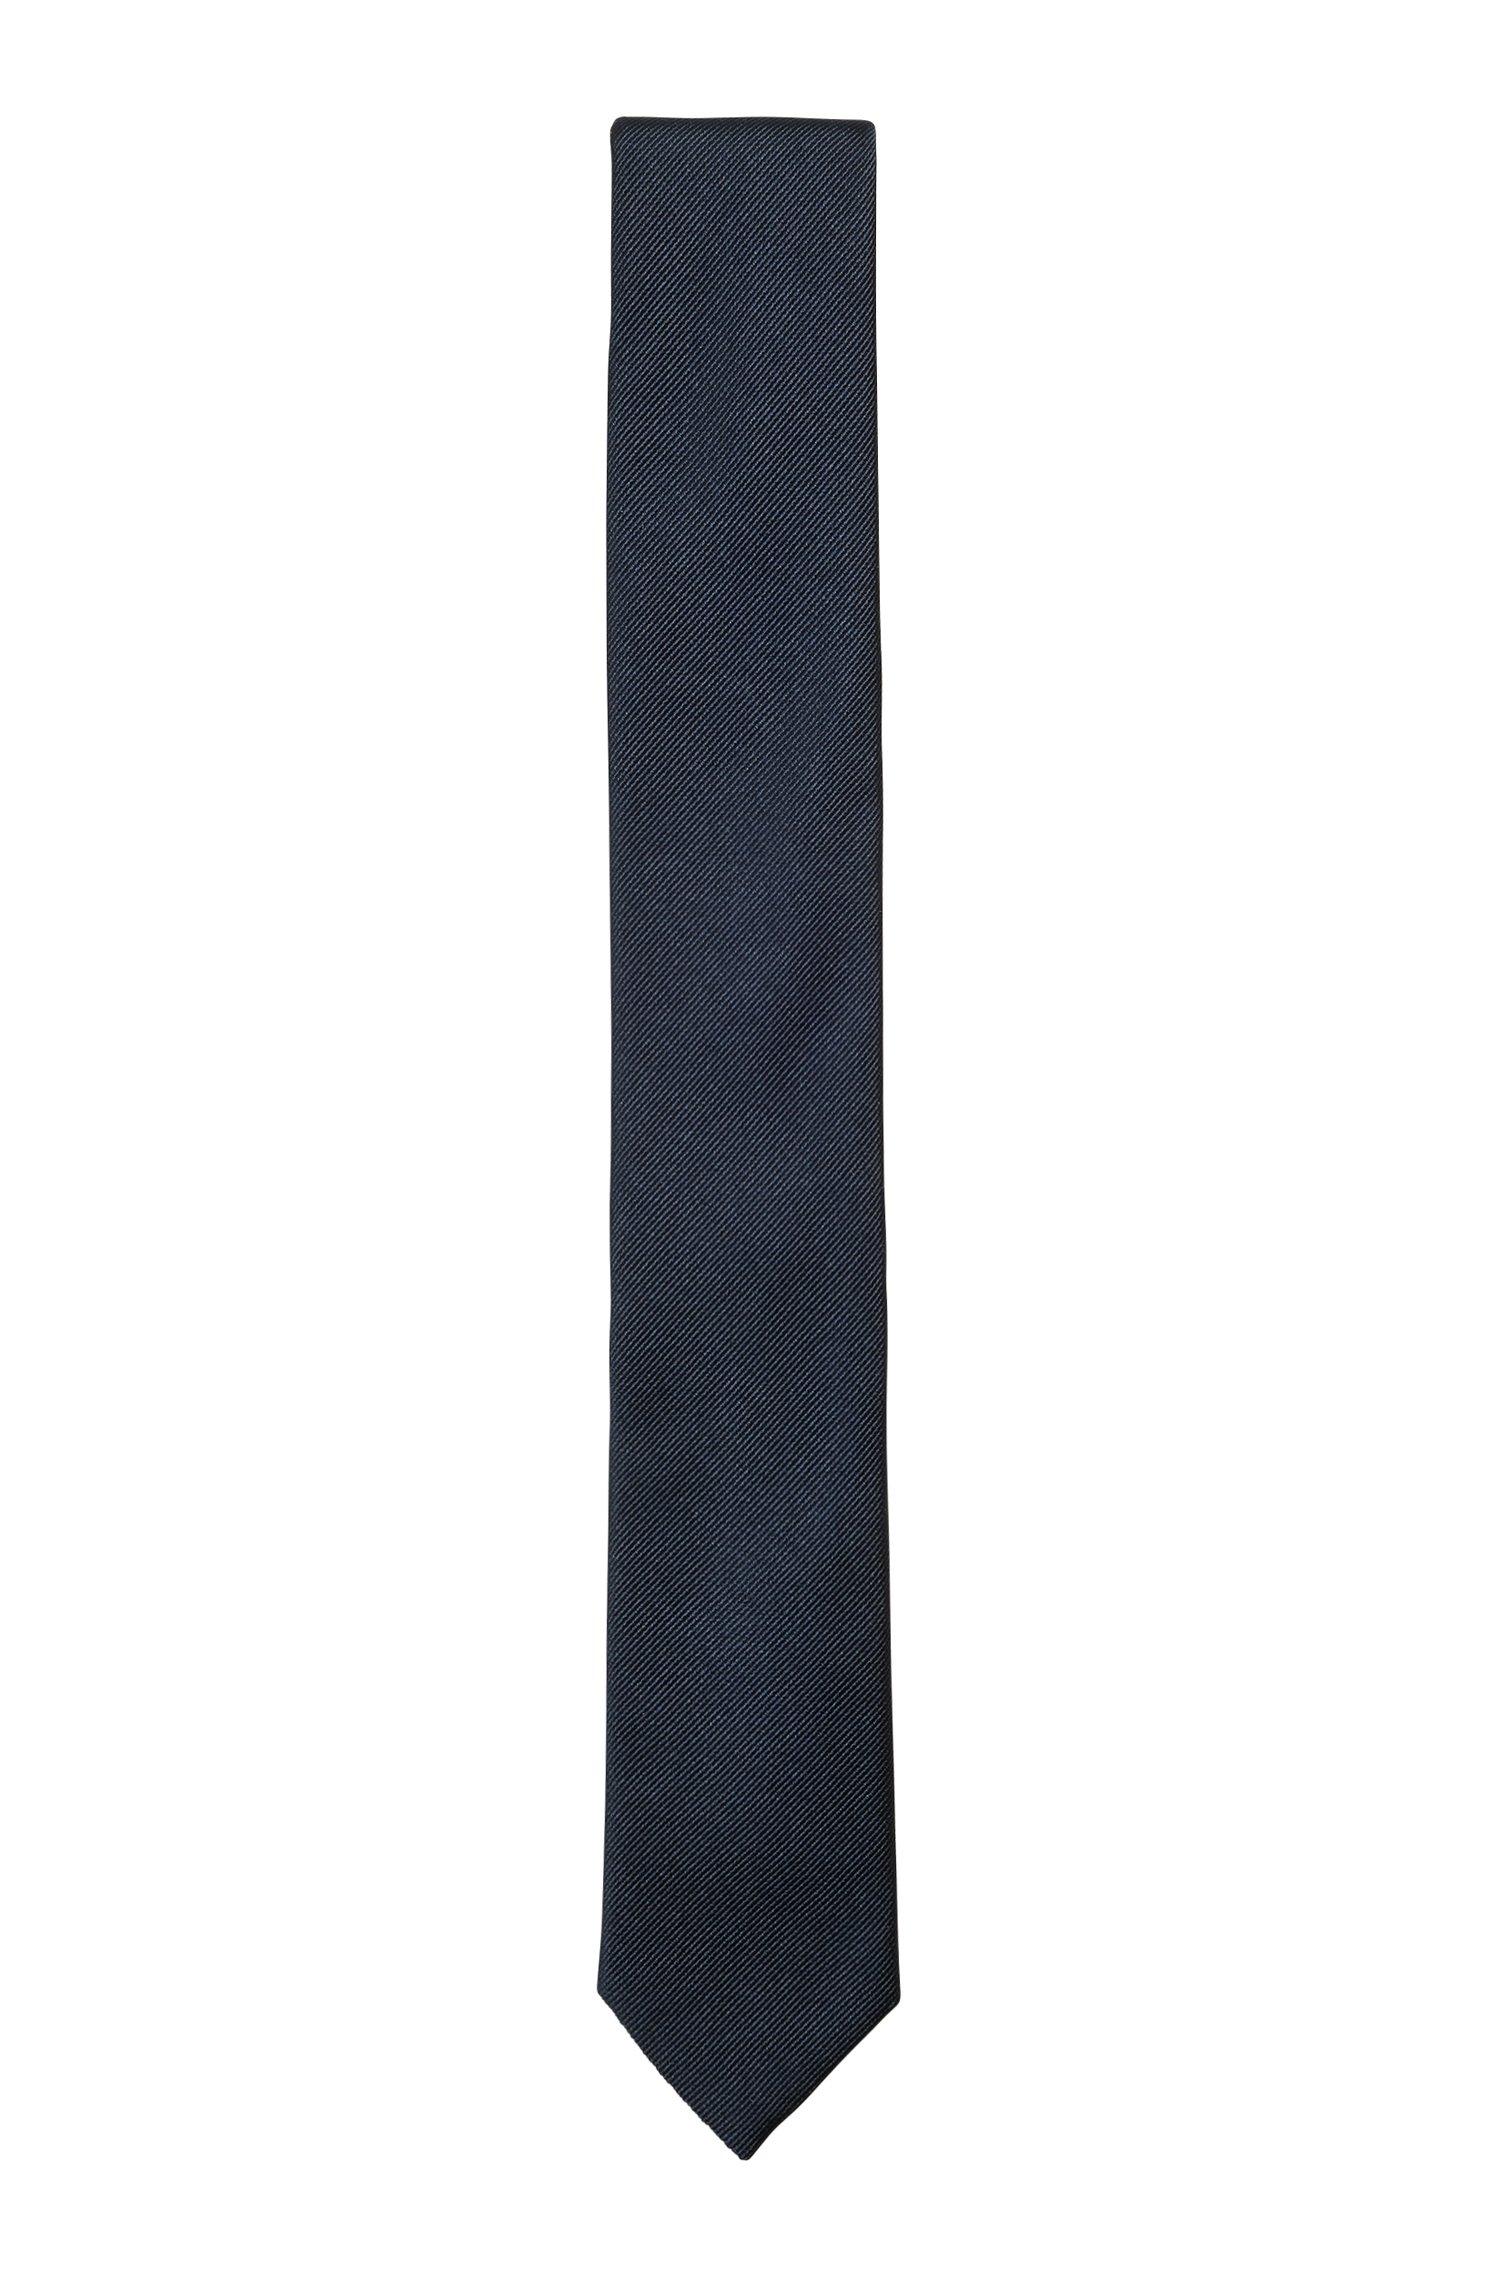 Silk-jacquard tie made in Italy, Dark Blue